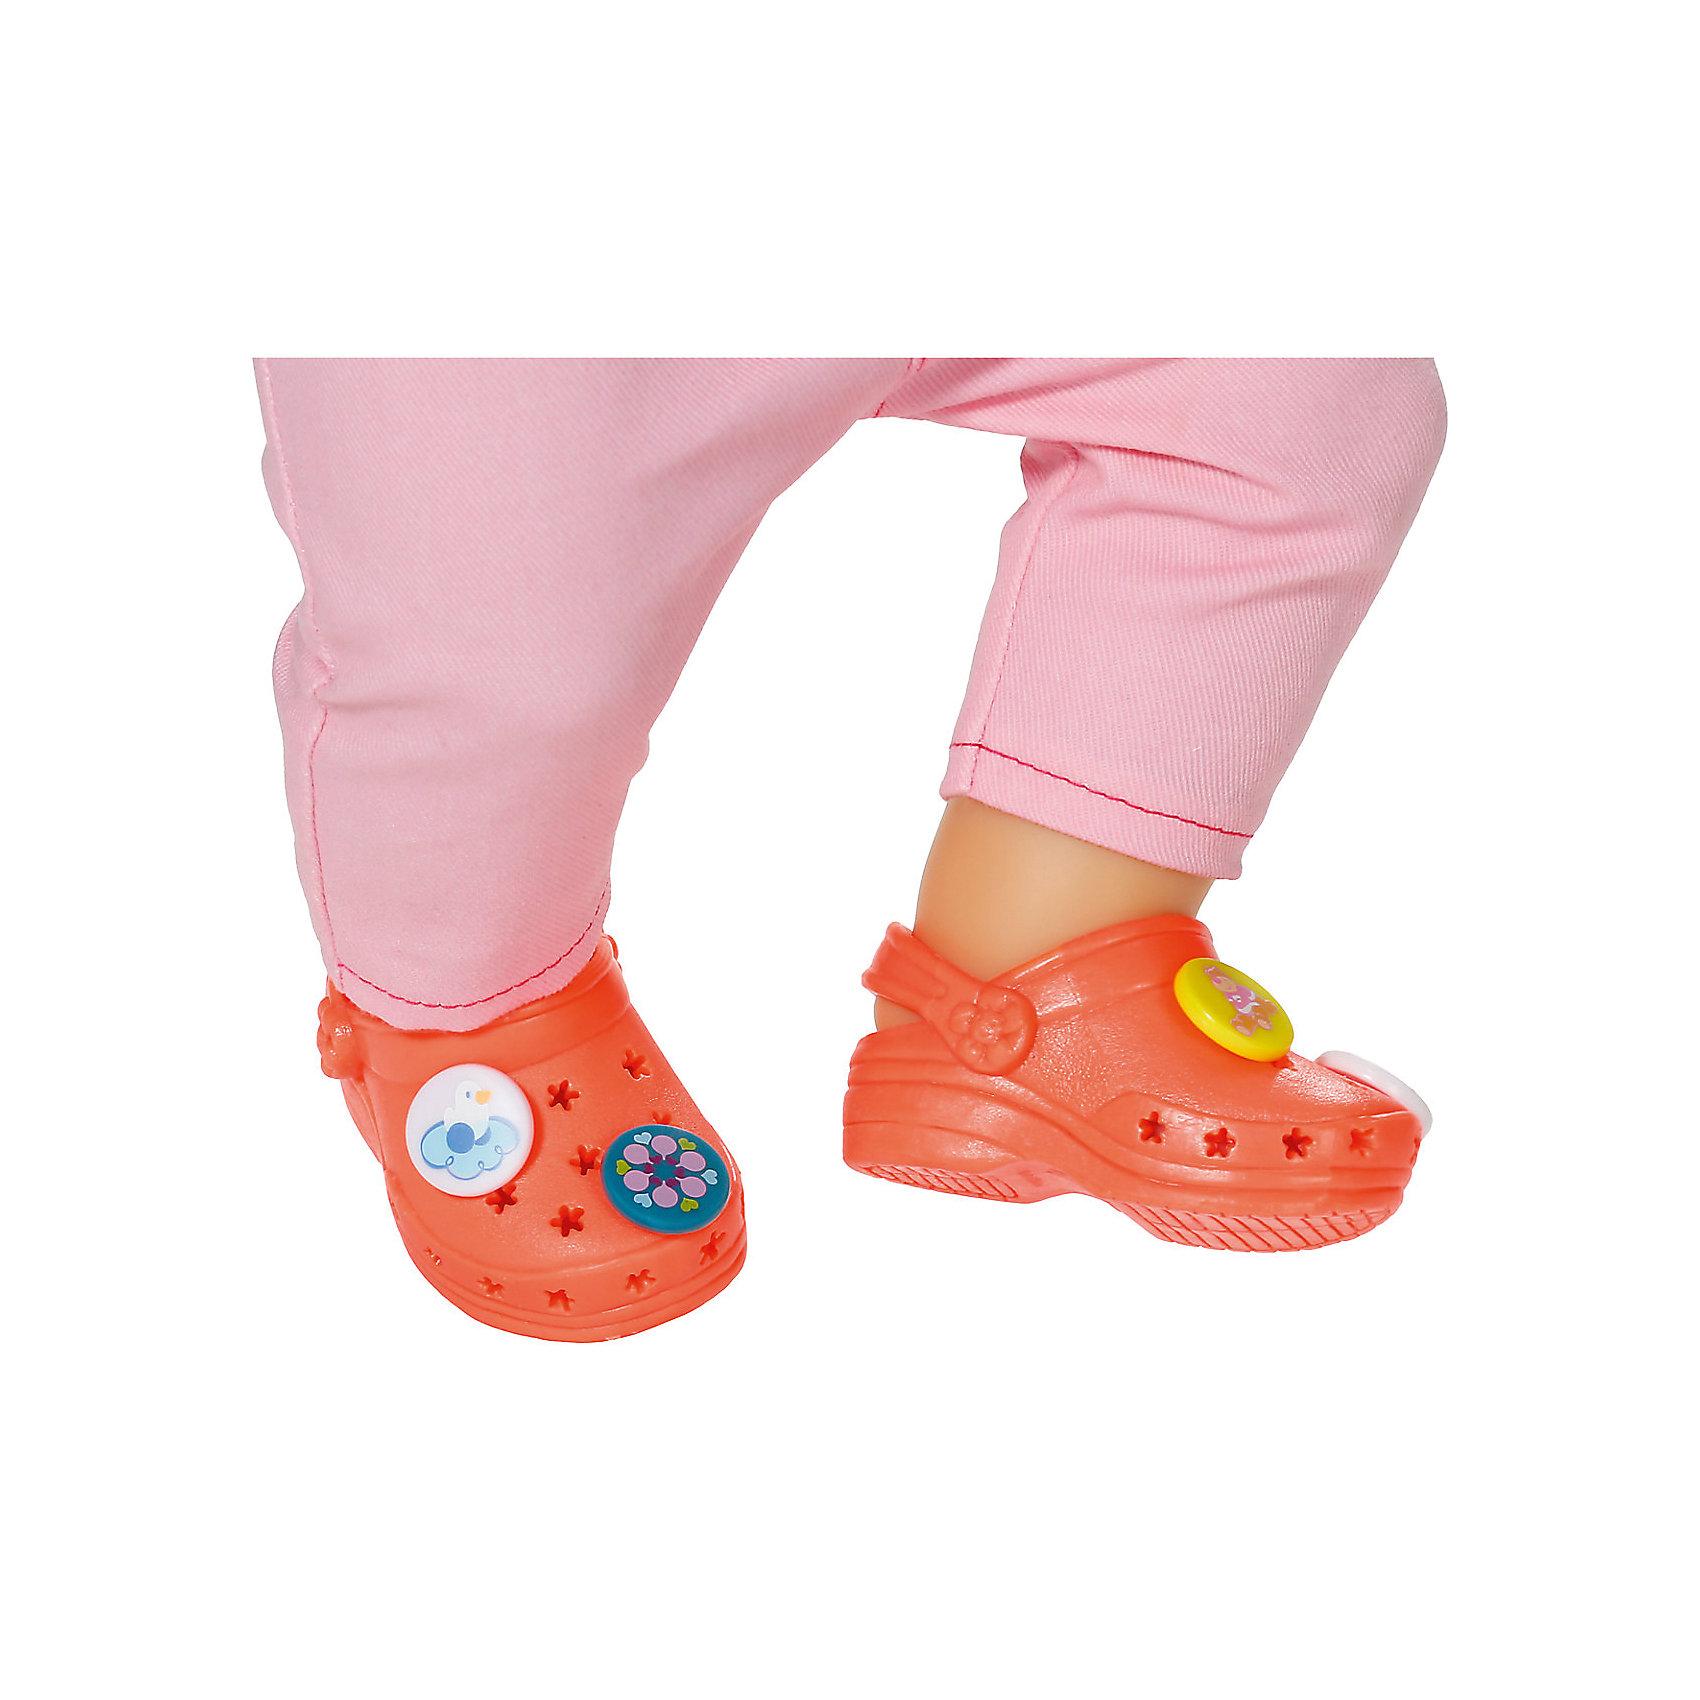 Zapf Creation Сандали фантазийные, оранжевые, BABY born сандали кожаные